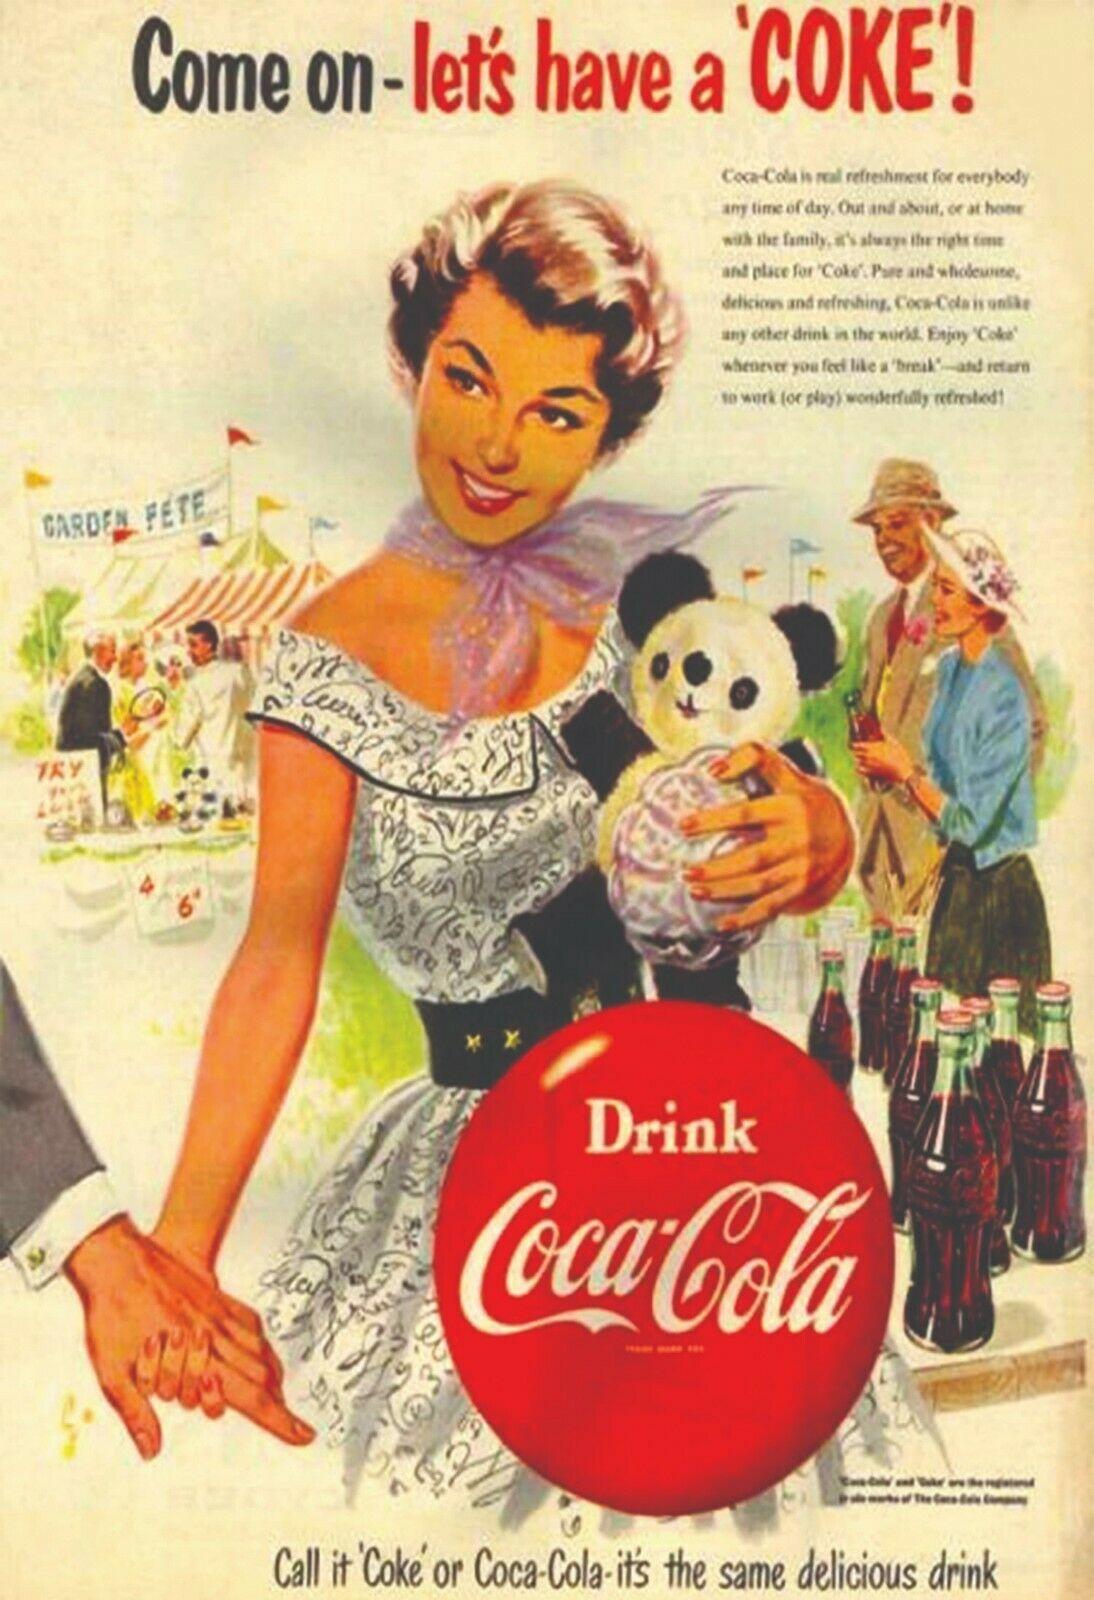 Vintage Soft Drink Ads reprint 8.50 x 11 inches photo 037 Coca Cola Pepsi